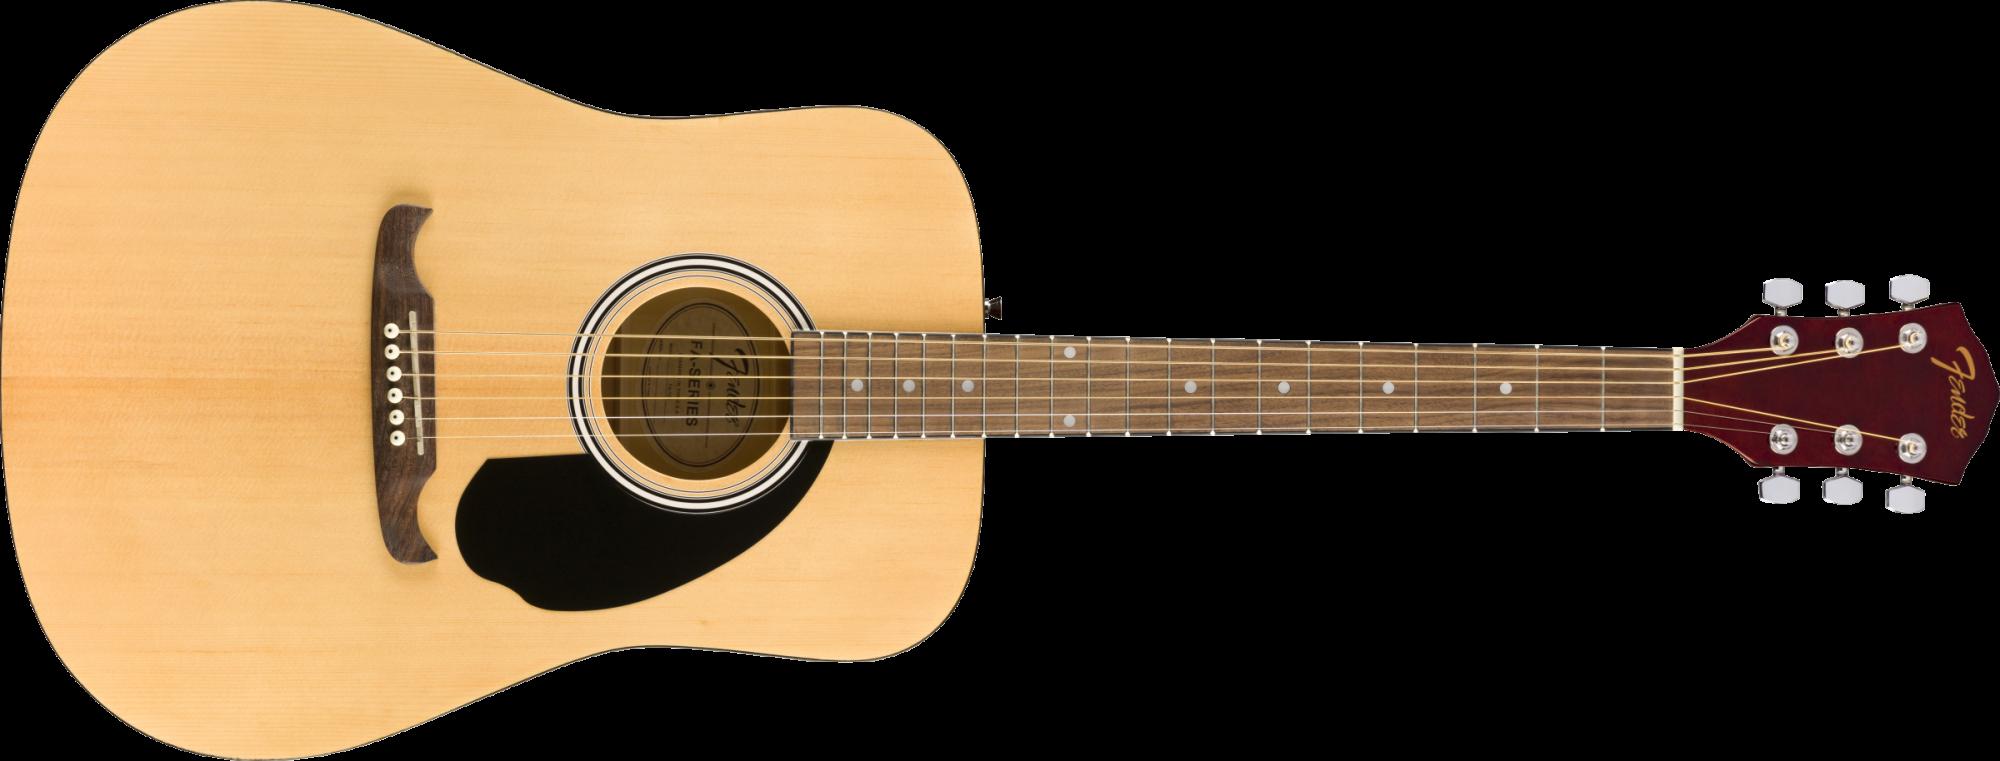 Fender FA-125 Dreadnought Guitar - Walnut Fingerboard - Natural